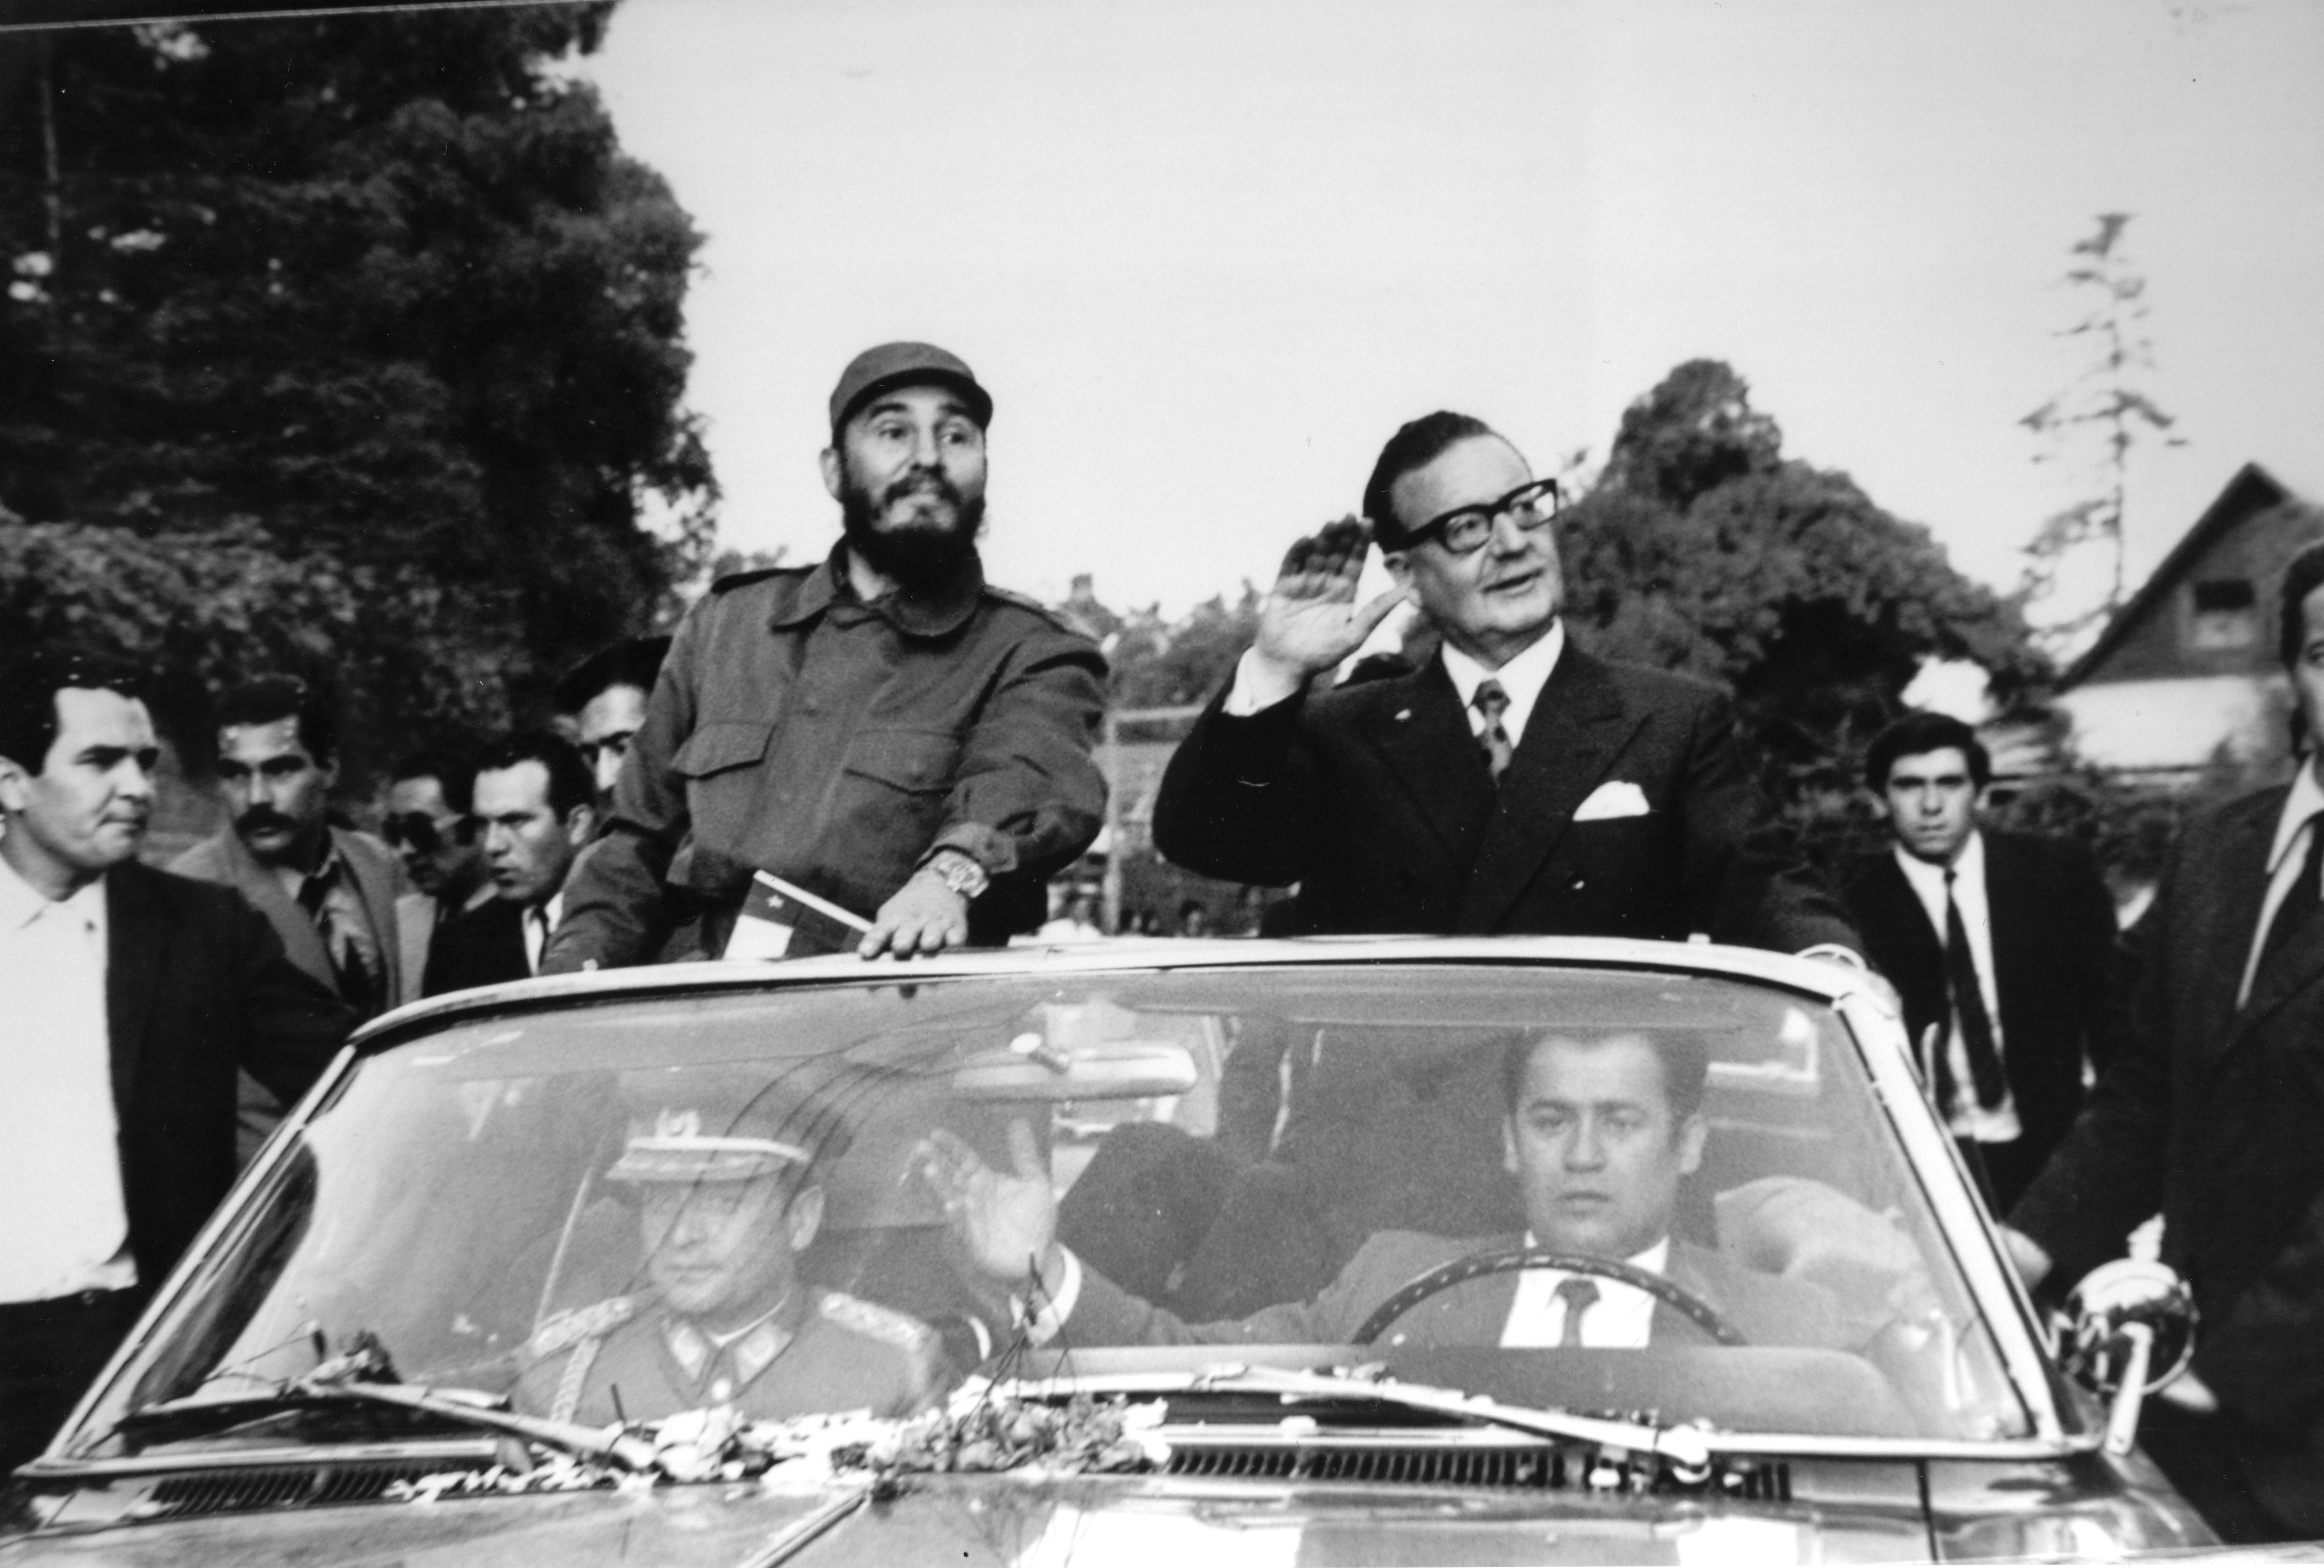 Fidel en Chile. Patán al volante